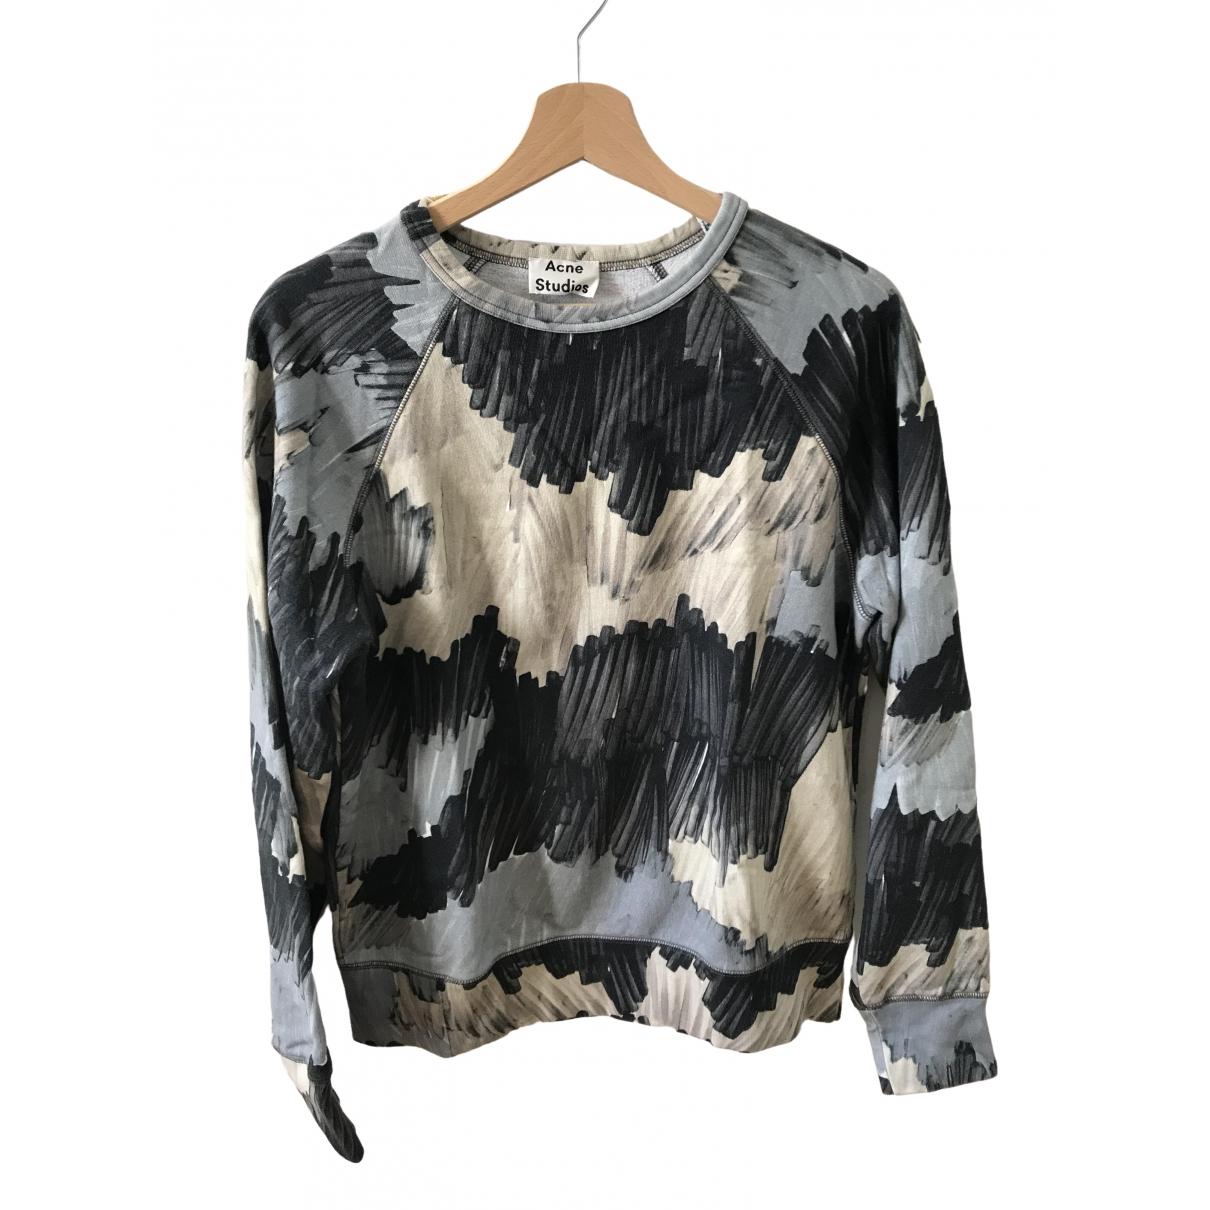 Acne Studios \N Multicolour Cotton Knitwear & Sweatshirts for Men XS International